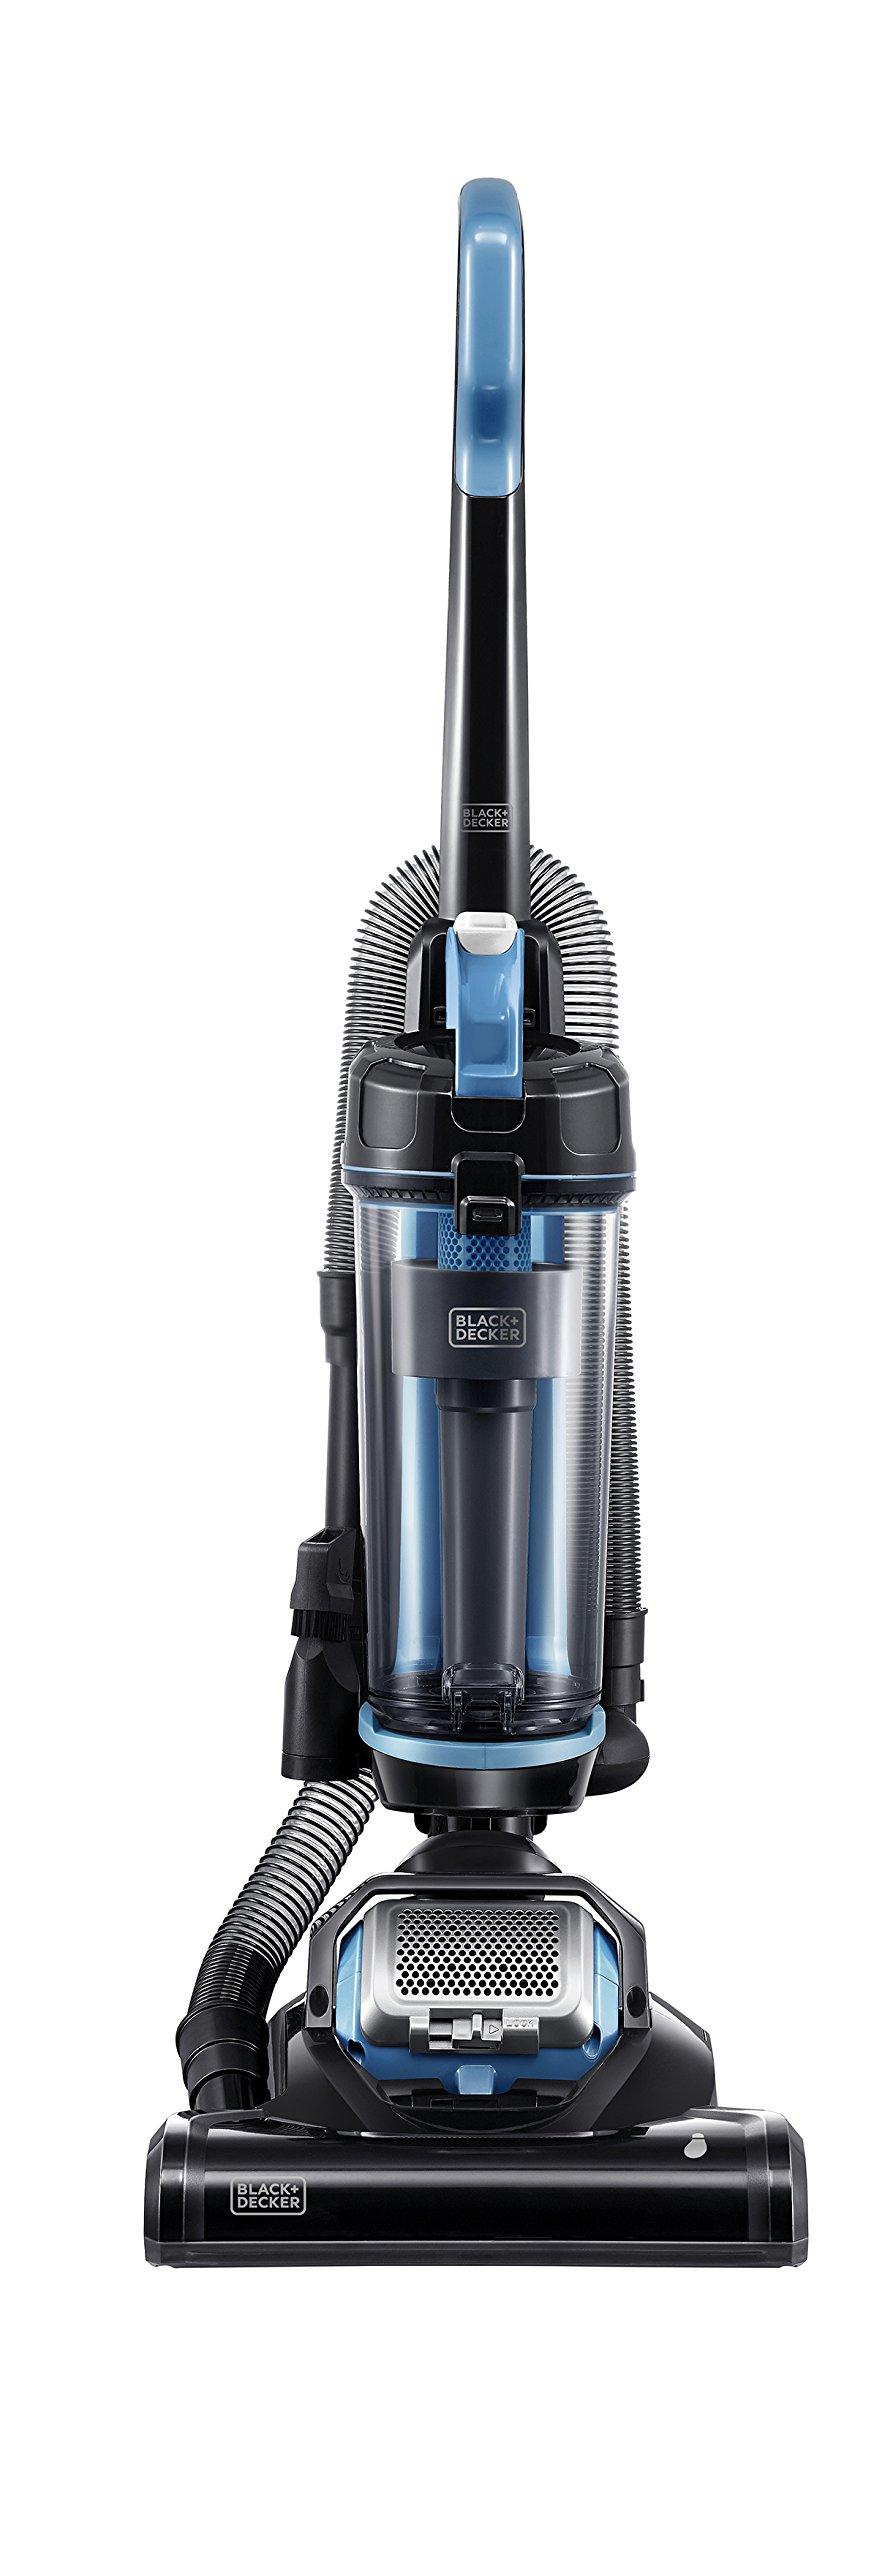 Black+Decker Ultra Light Weight, Lite Black & Decker BDASL202 AIRSWIVEL Lightweight, Powerful Upright Vacuum Cleaner, Blue by BLACK+DECKER